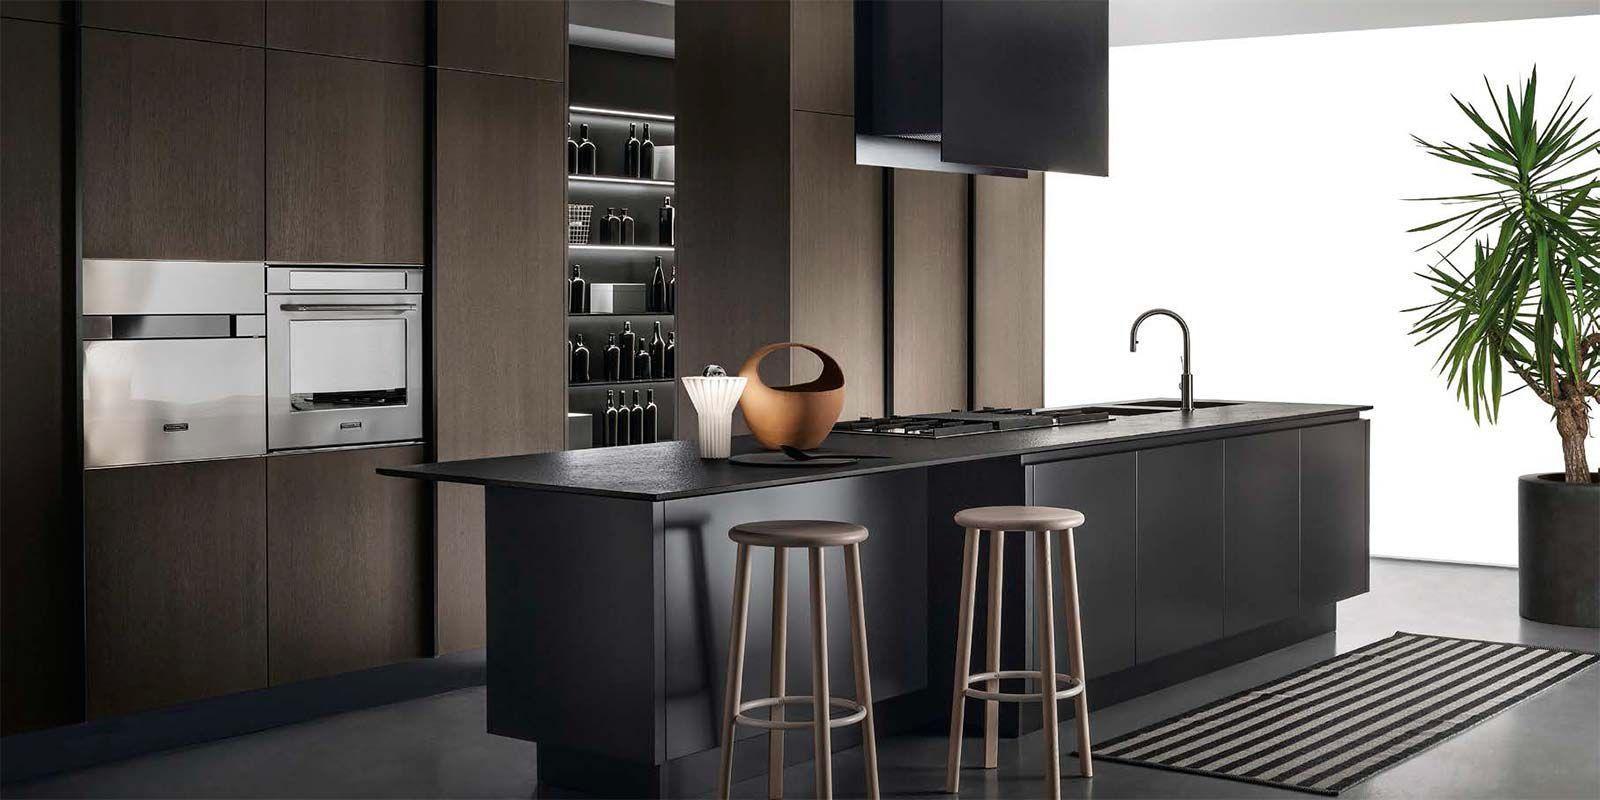 Cucina moderna / in legno / con isola / opaca - EMETRICA by ...